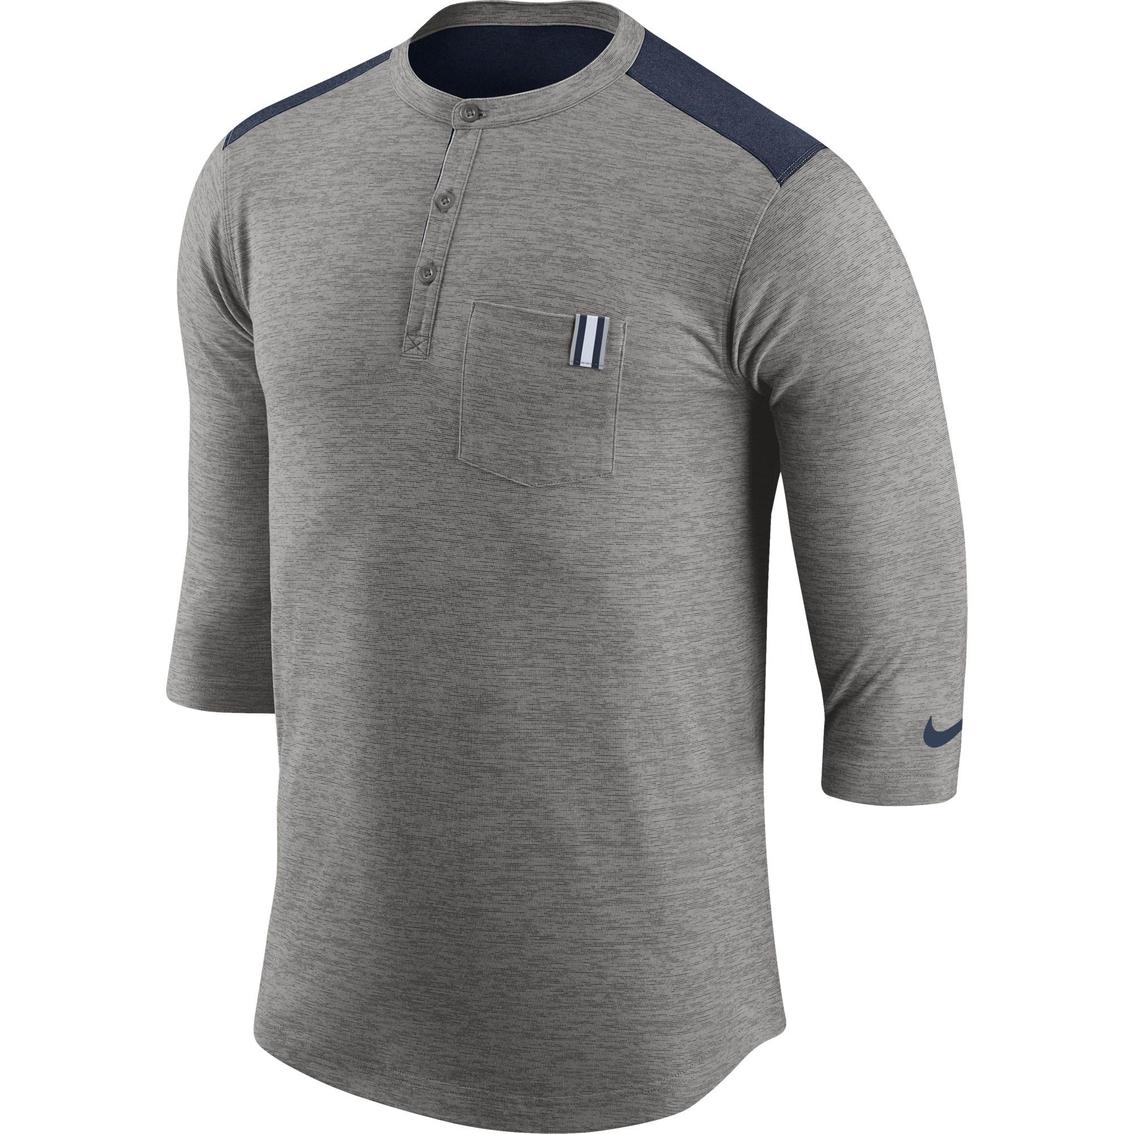 d40c2f7ce Nike Nfl Dallas Cowboys Henley | Shirts | Sports & Outdoors | Shop ...